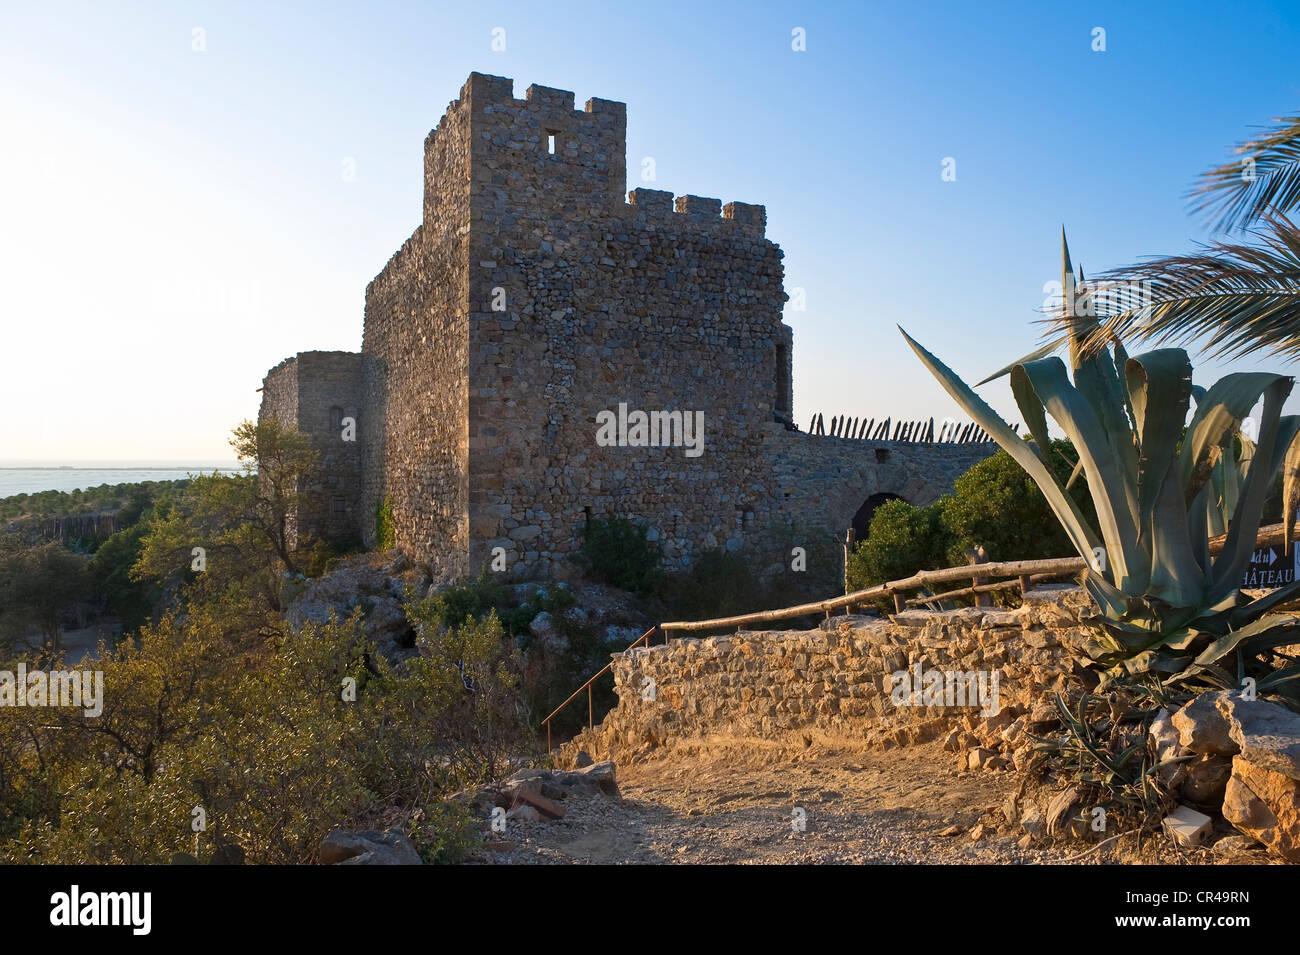 France, Aude, Corbieres, Fitou, Chateau de Fitou, 10th century castle on a rock spur dominating the town - Stock Image